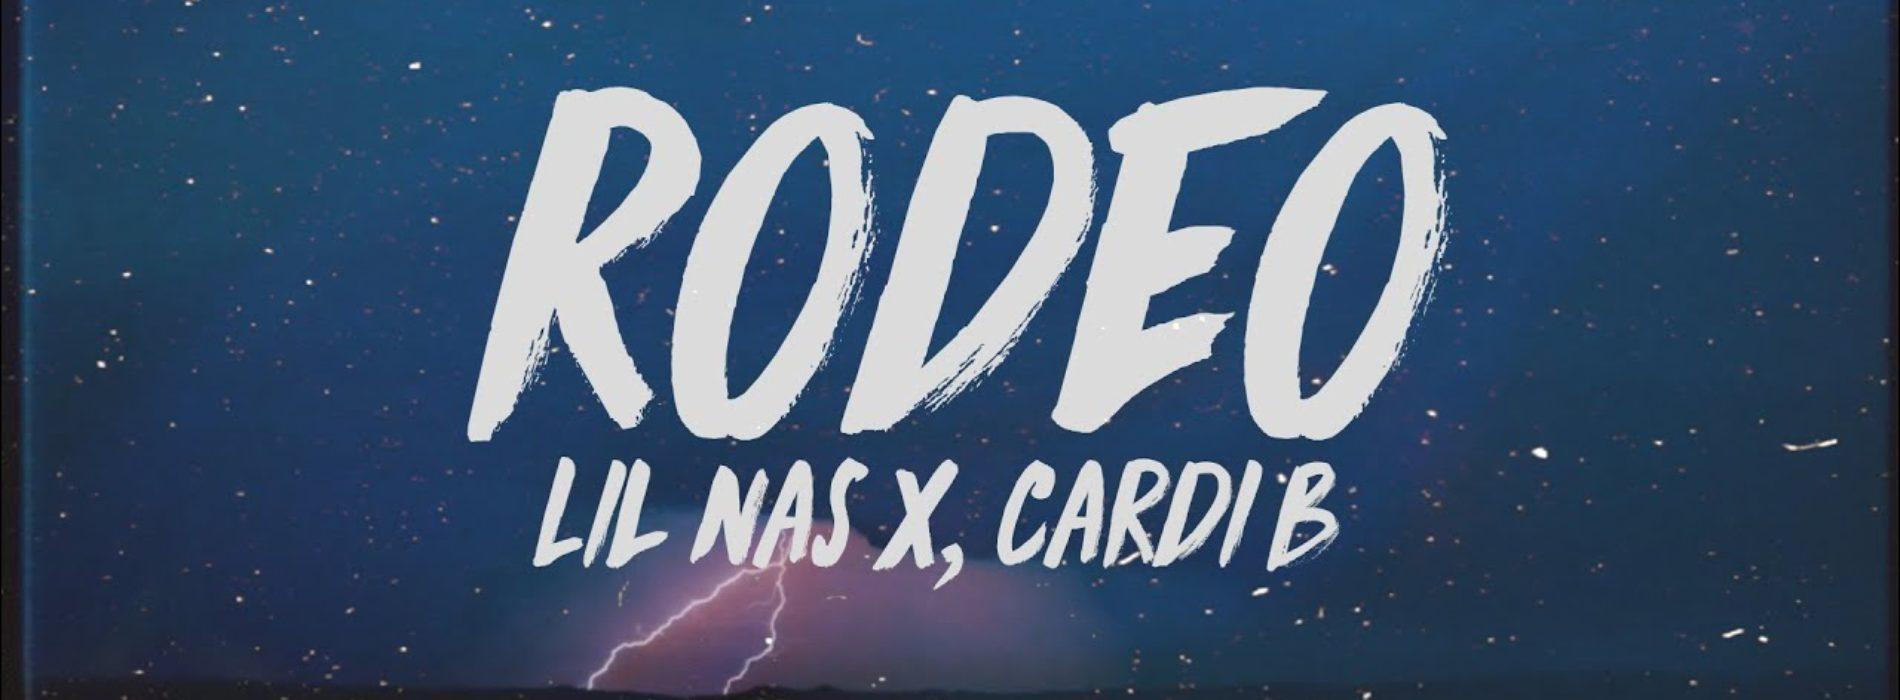 Lil Nas X, Cardi B – Rodeo (Official Audio) – Juin 2019